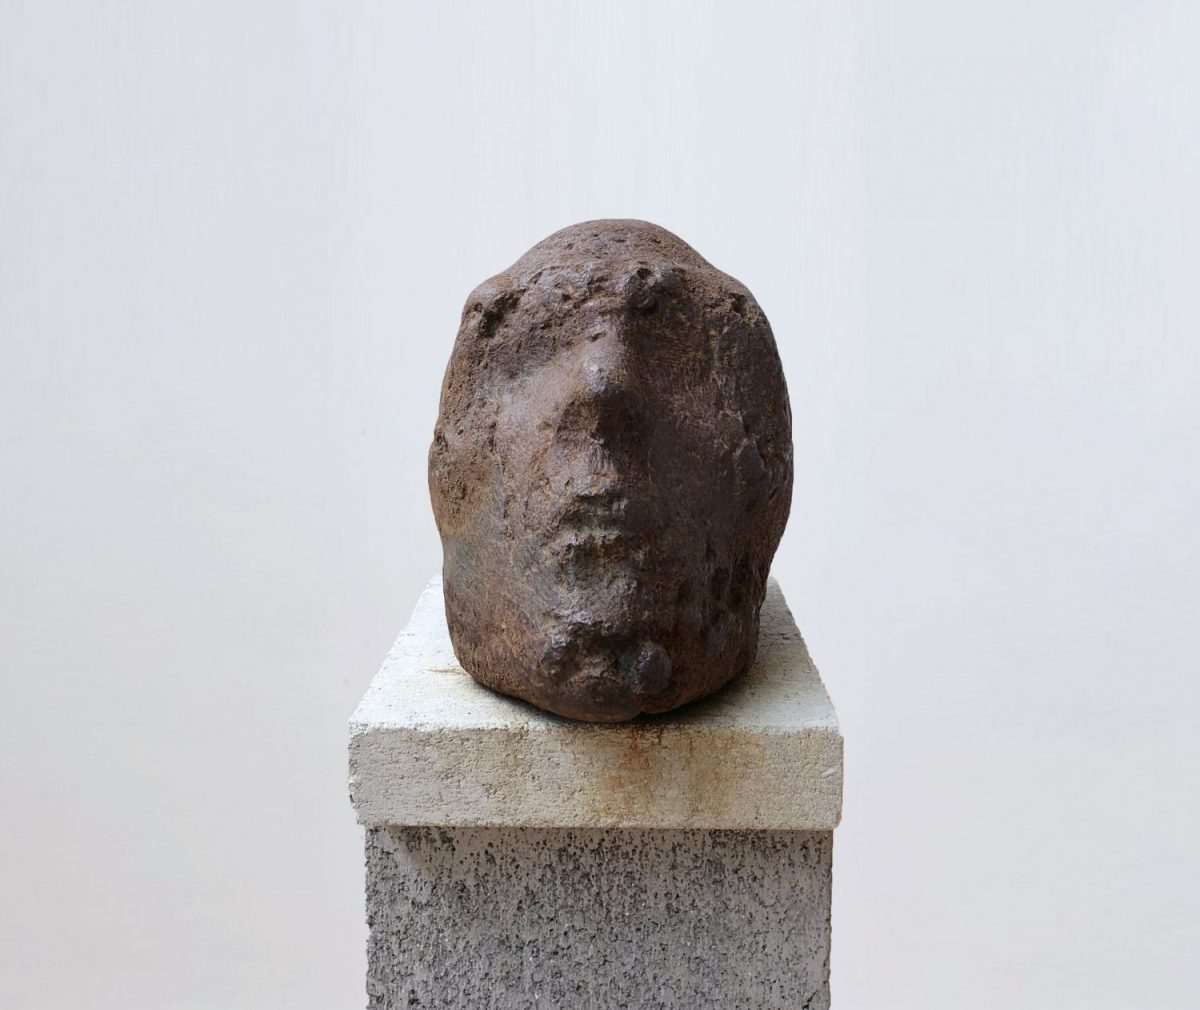 Gary Deirmendjian, 'the seasons i', 2005, cast iron, 30 x 43 x 33 cm, unique